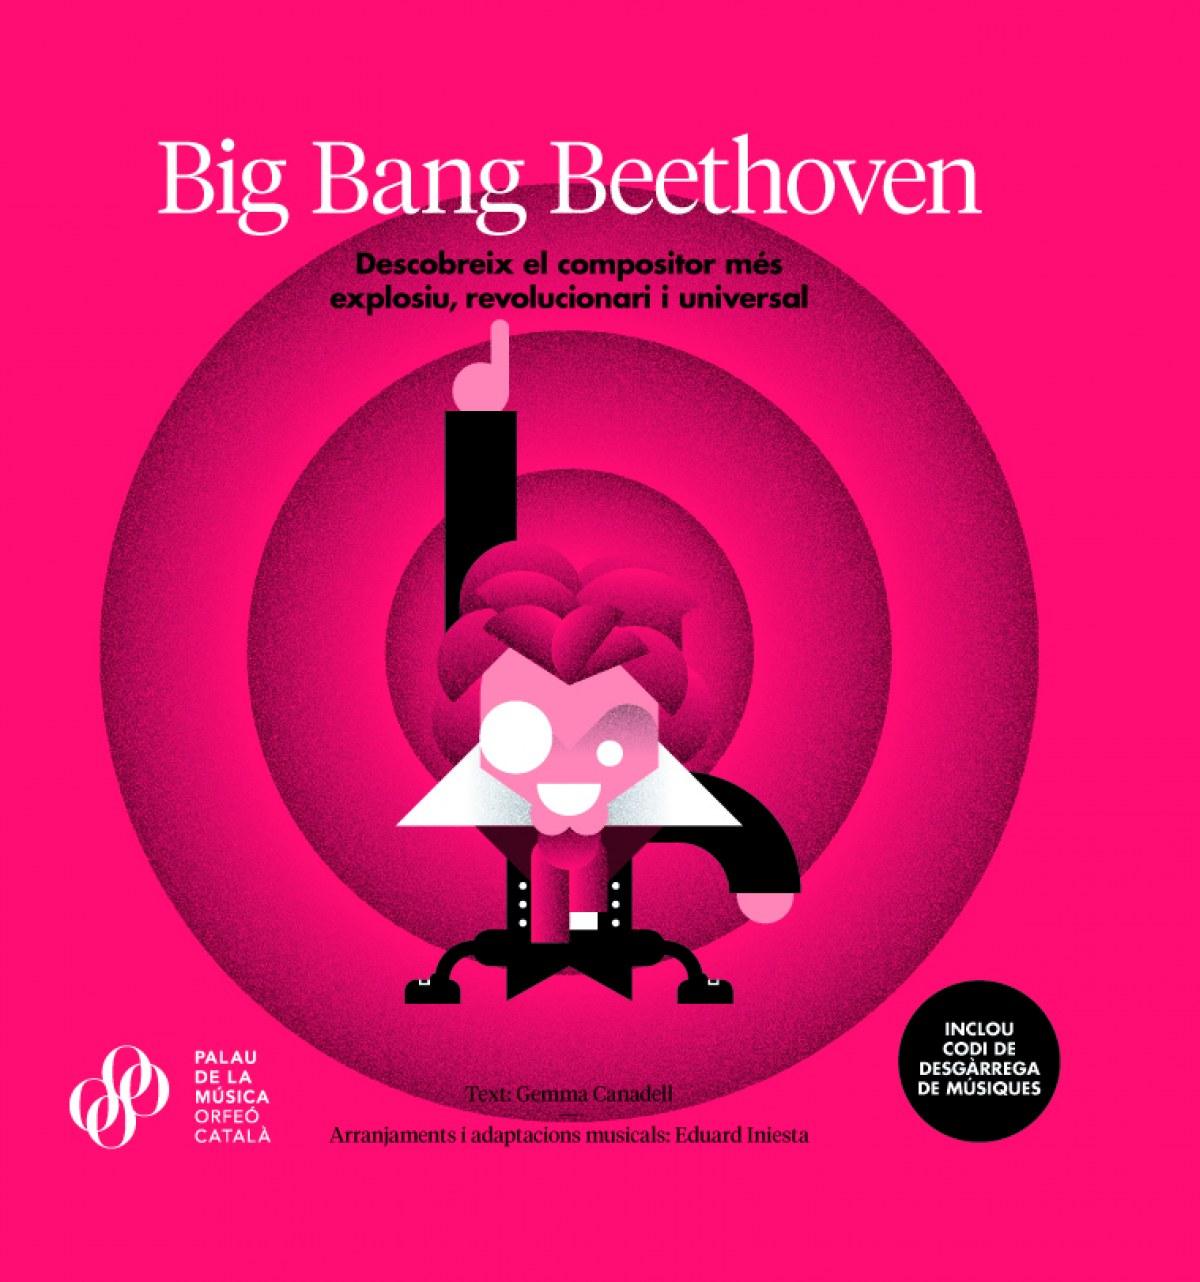 BIG BANG BEETHOVEN - CAT